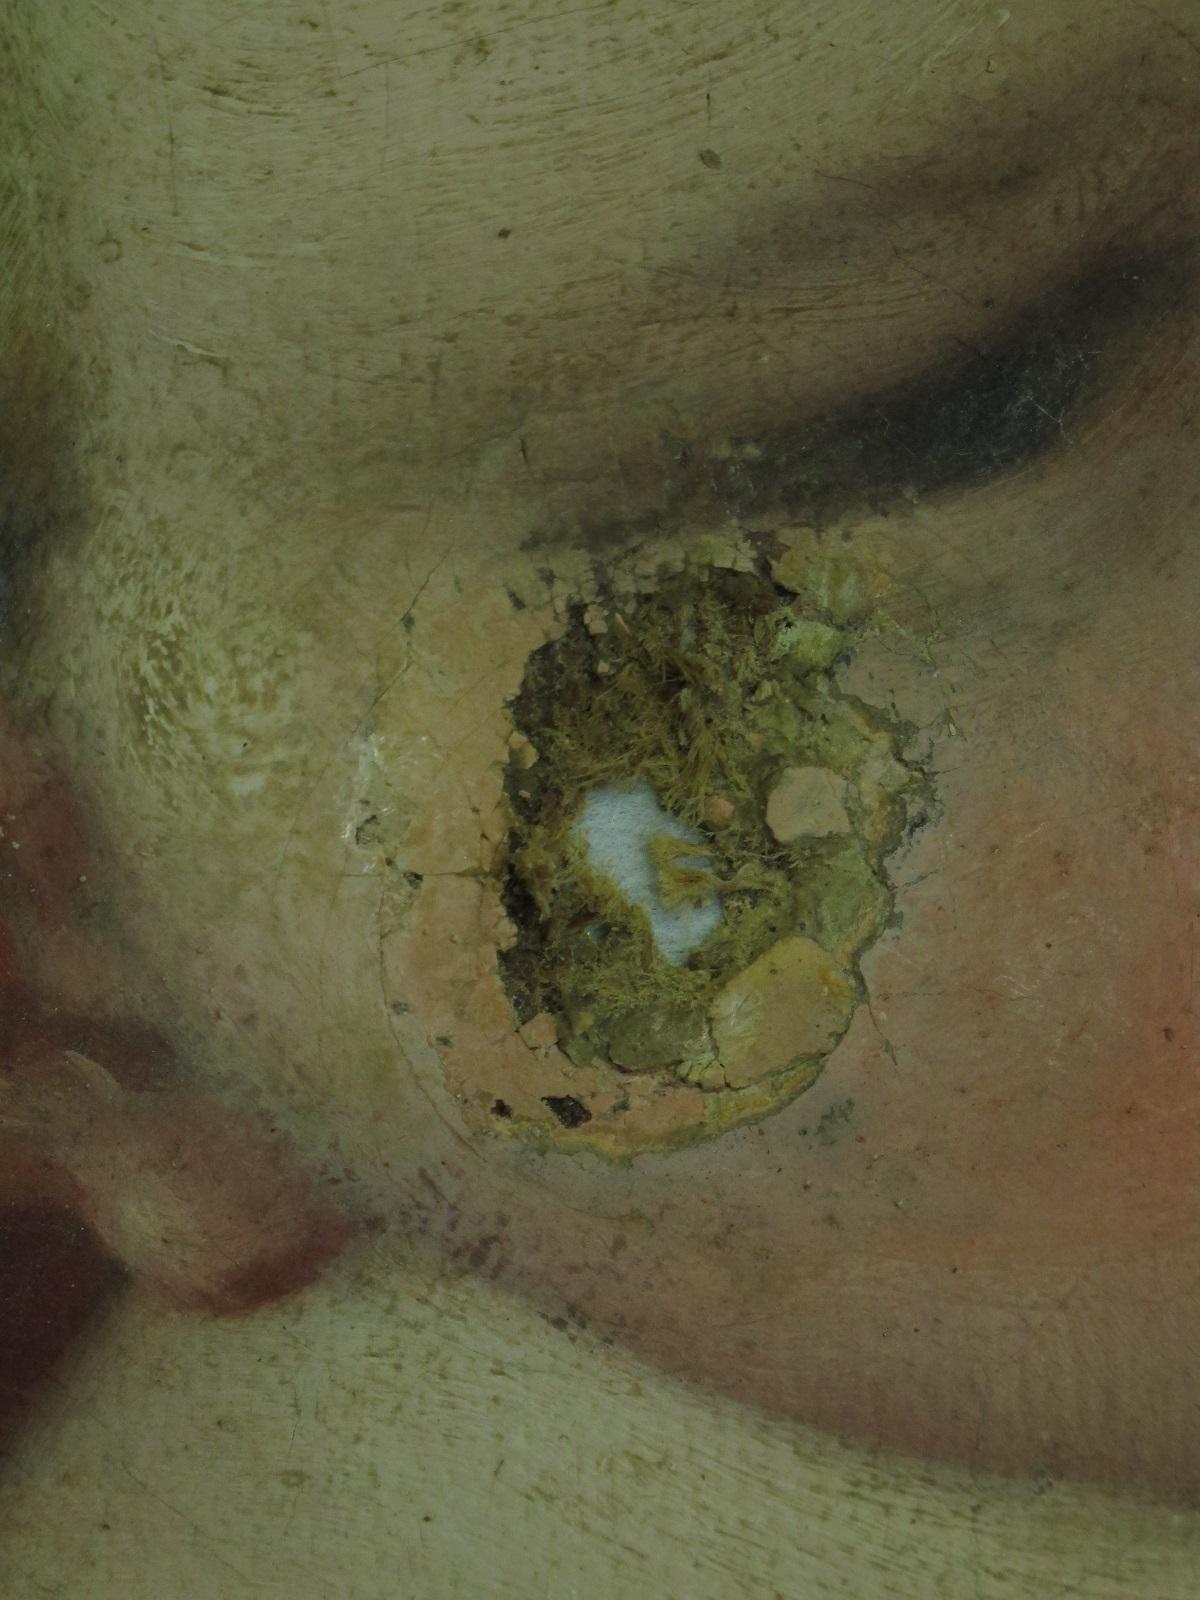 Mold ate away at Baby Jesus' cheek